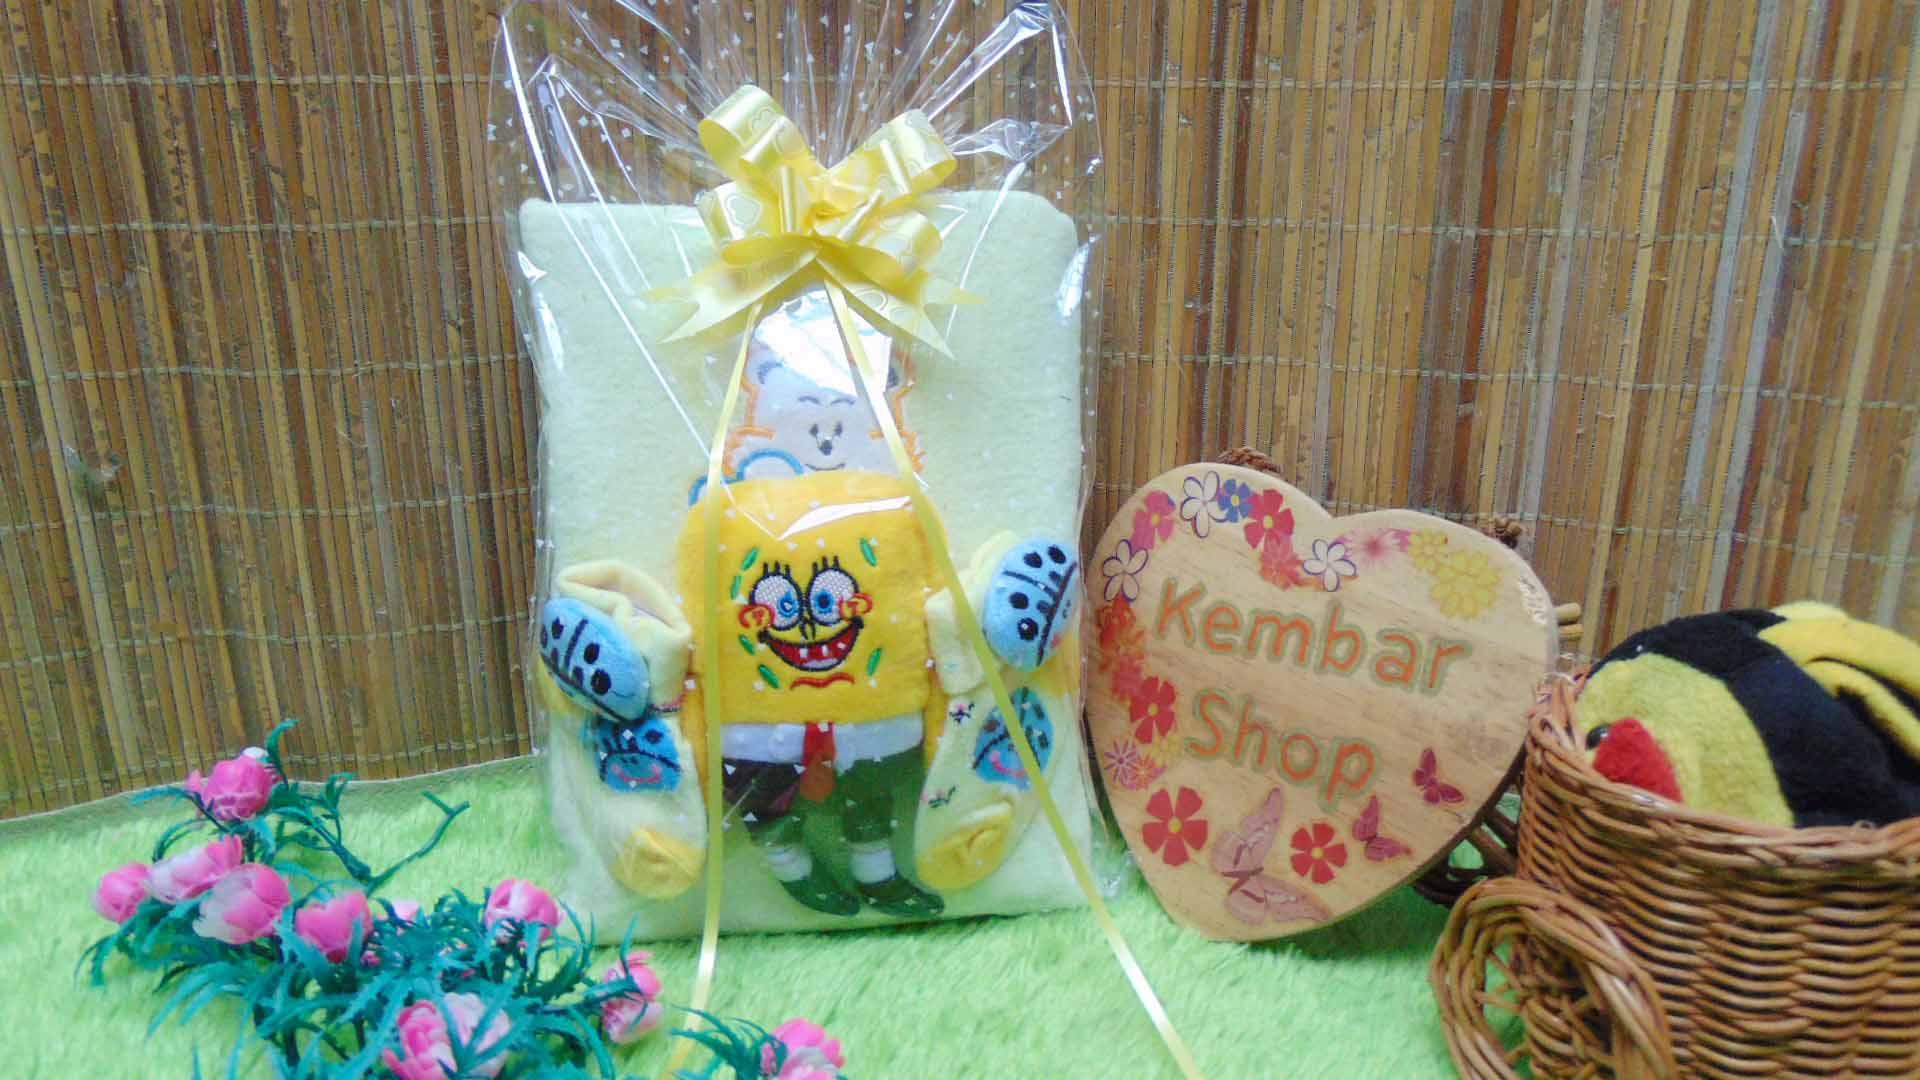 FREE KARTU UCAPAN hampers baby gift set paket kado lahiran souvenir bayi newborn HANDUK SOCK BONEKA kuning